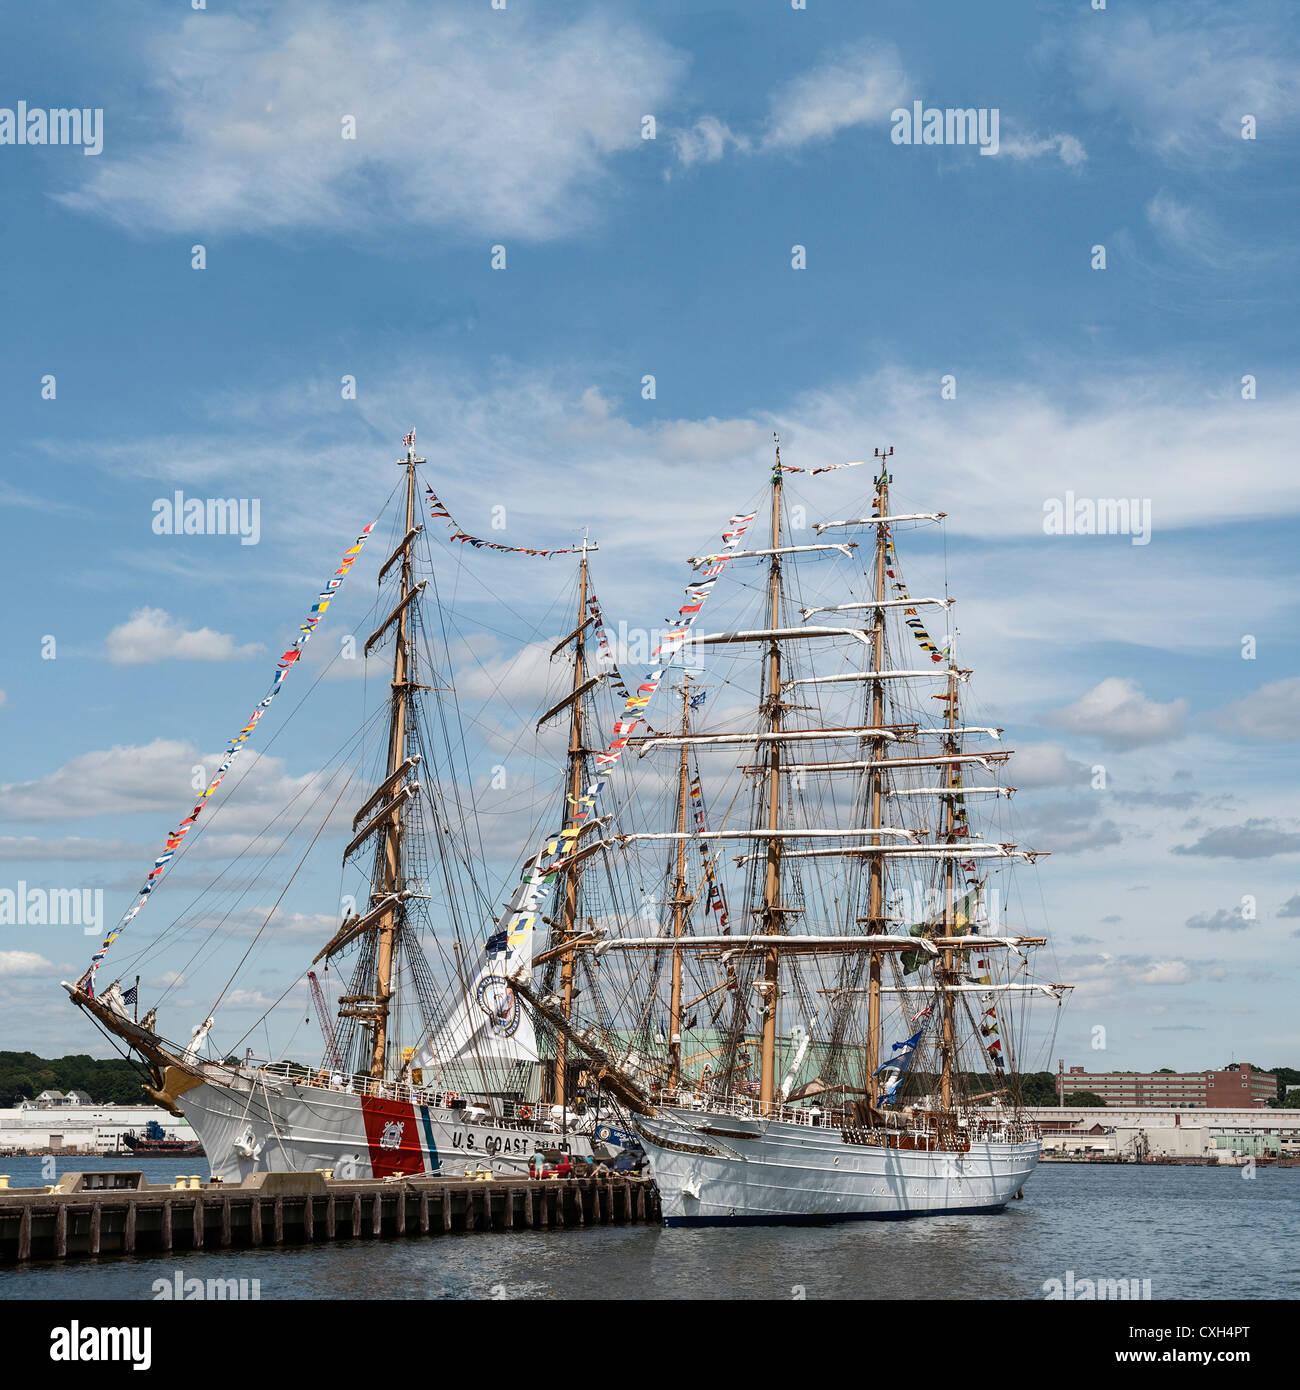 New London Connecticut US July 9 2012: The US Coast Guard training ship Eagle and the Brazilian Navy training ship - Stock Image